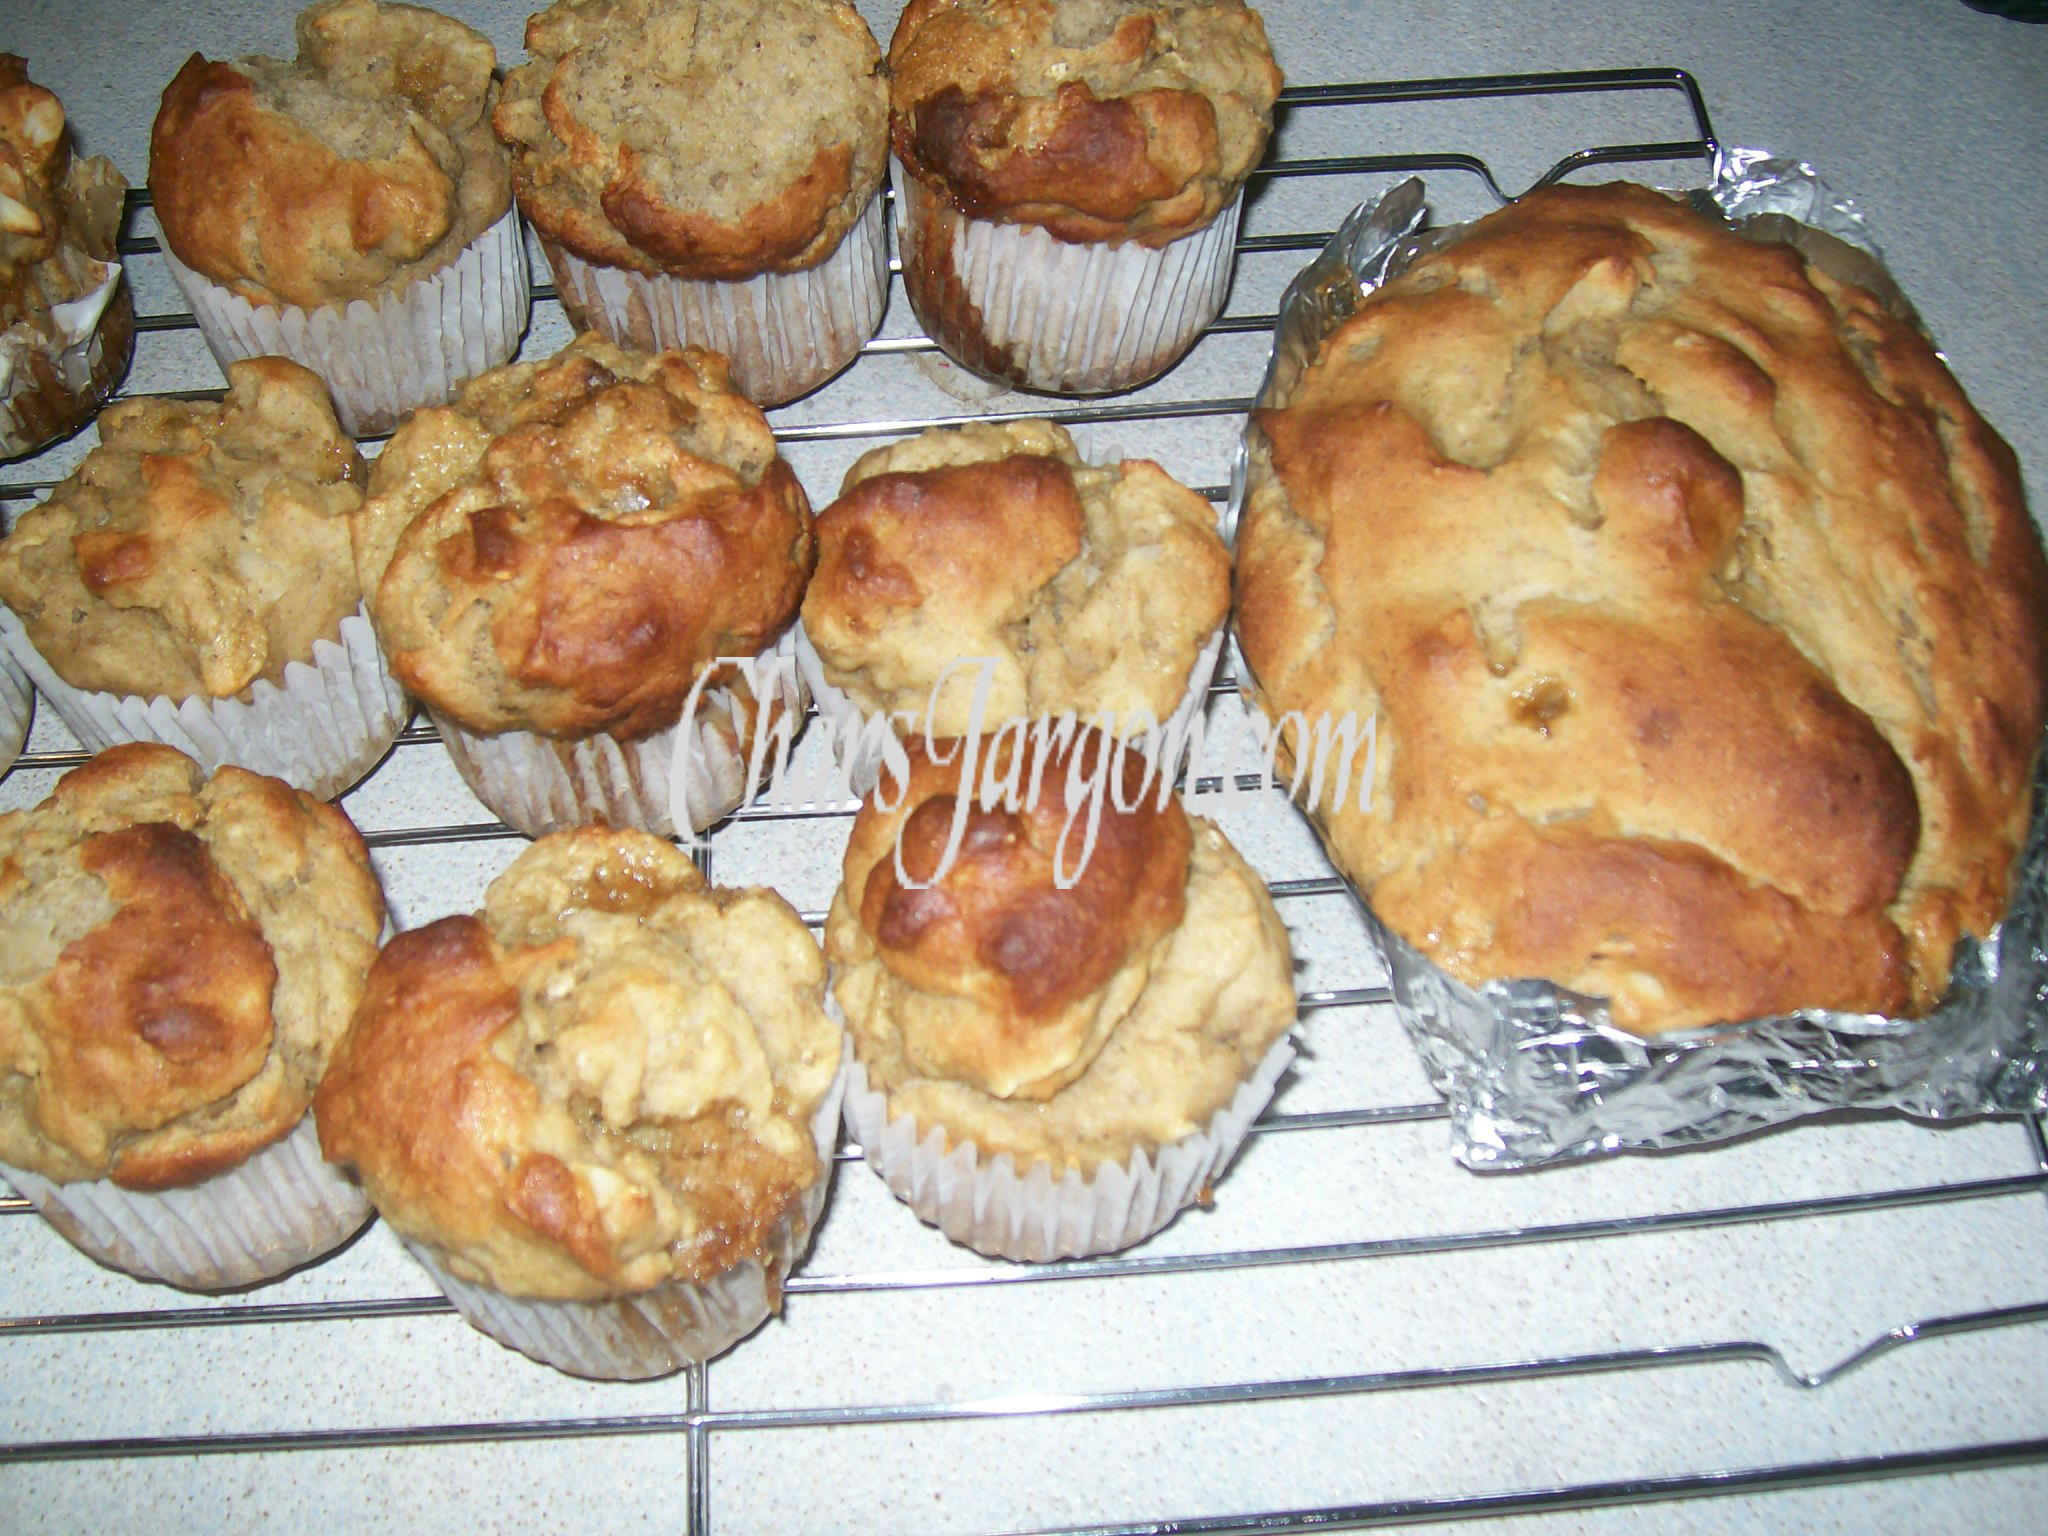 Gluten Free Banana Walnut muffins